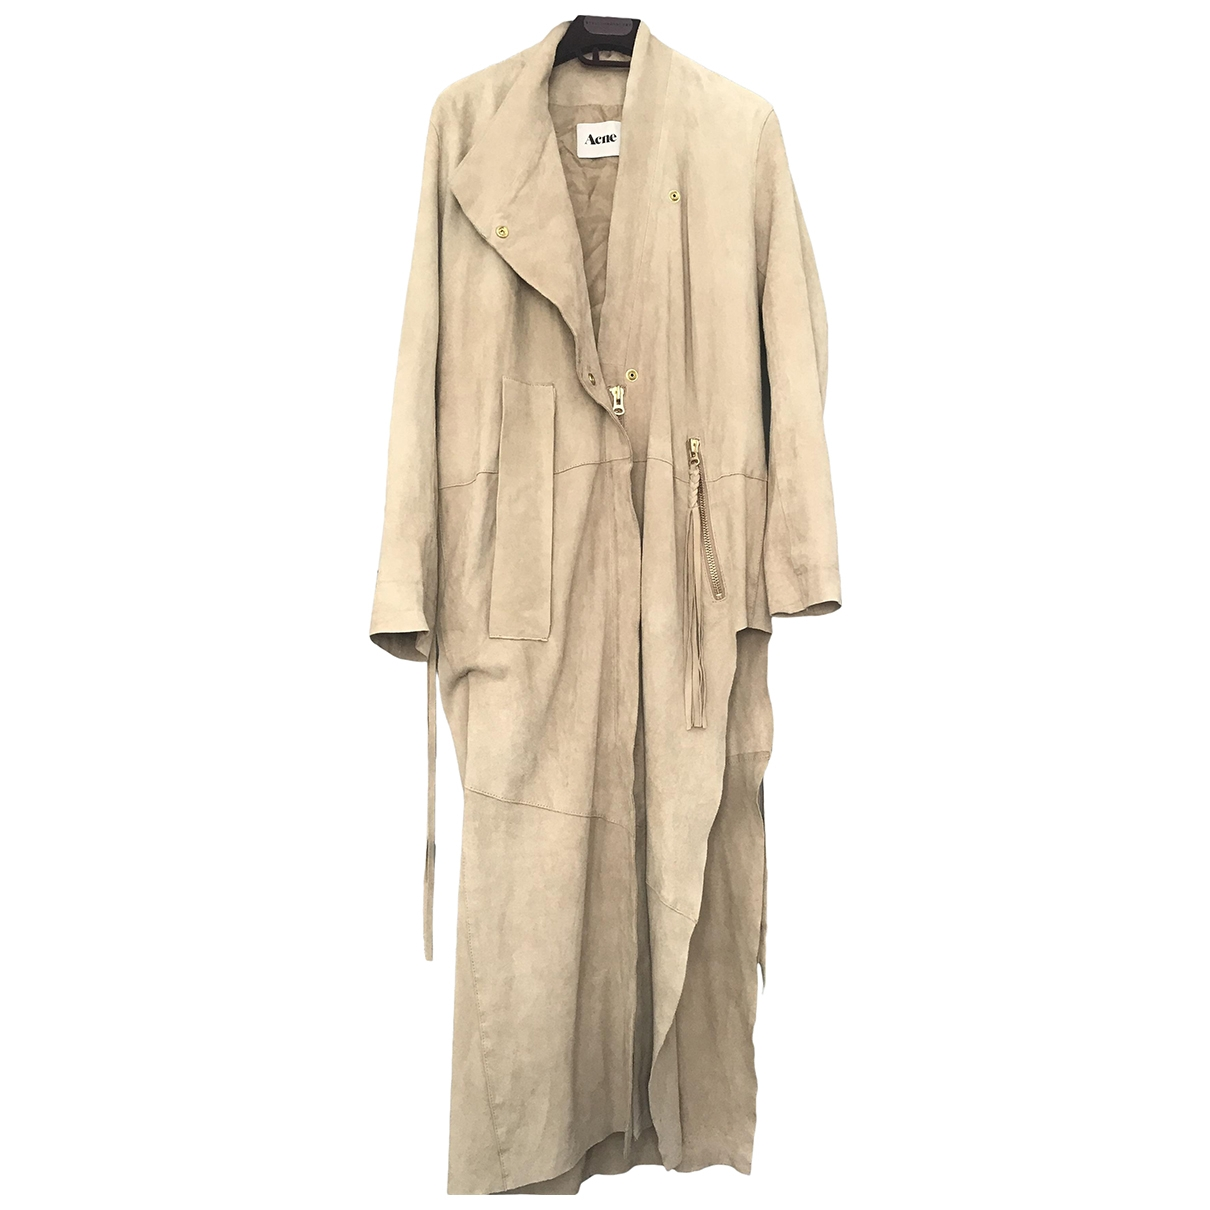 Acne Studios \N Beige Suede coat for Women 36 FR